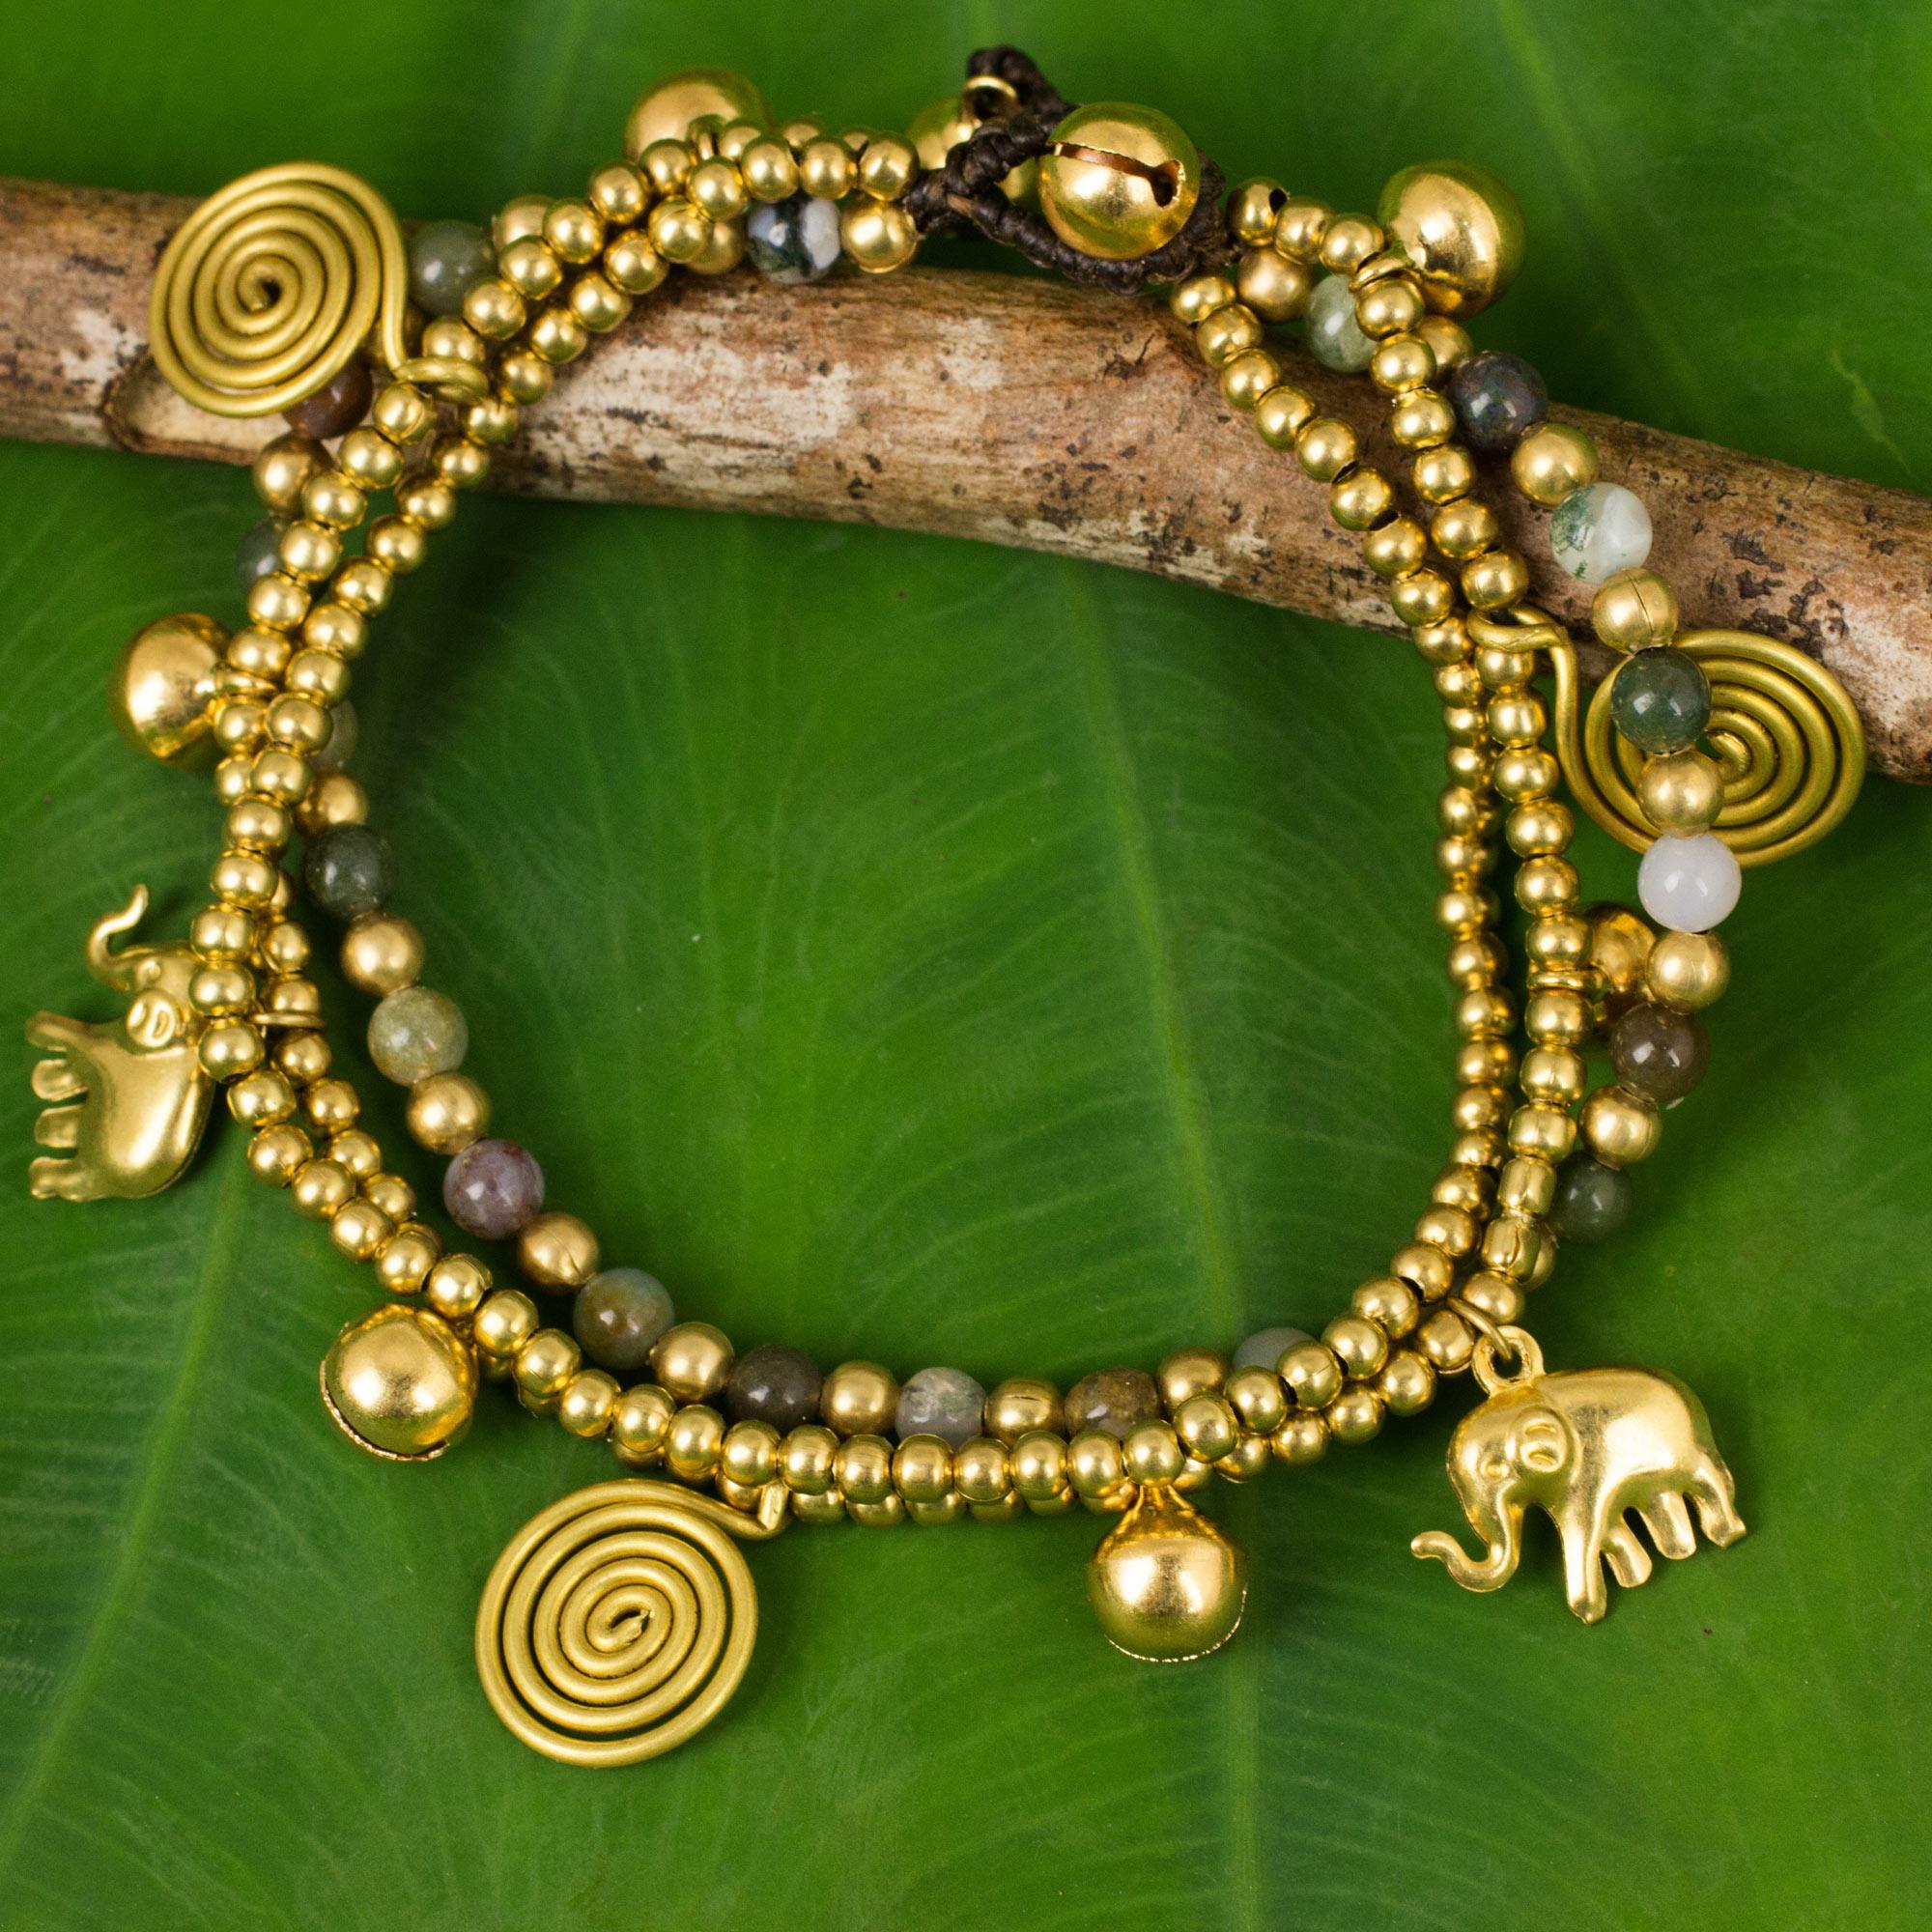 Jasper and Brass Beaded Charm Bracelet Colorful Siam Elephants